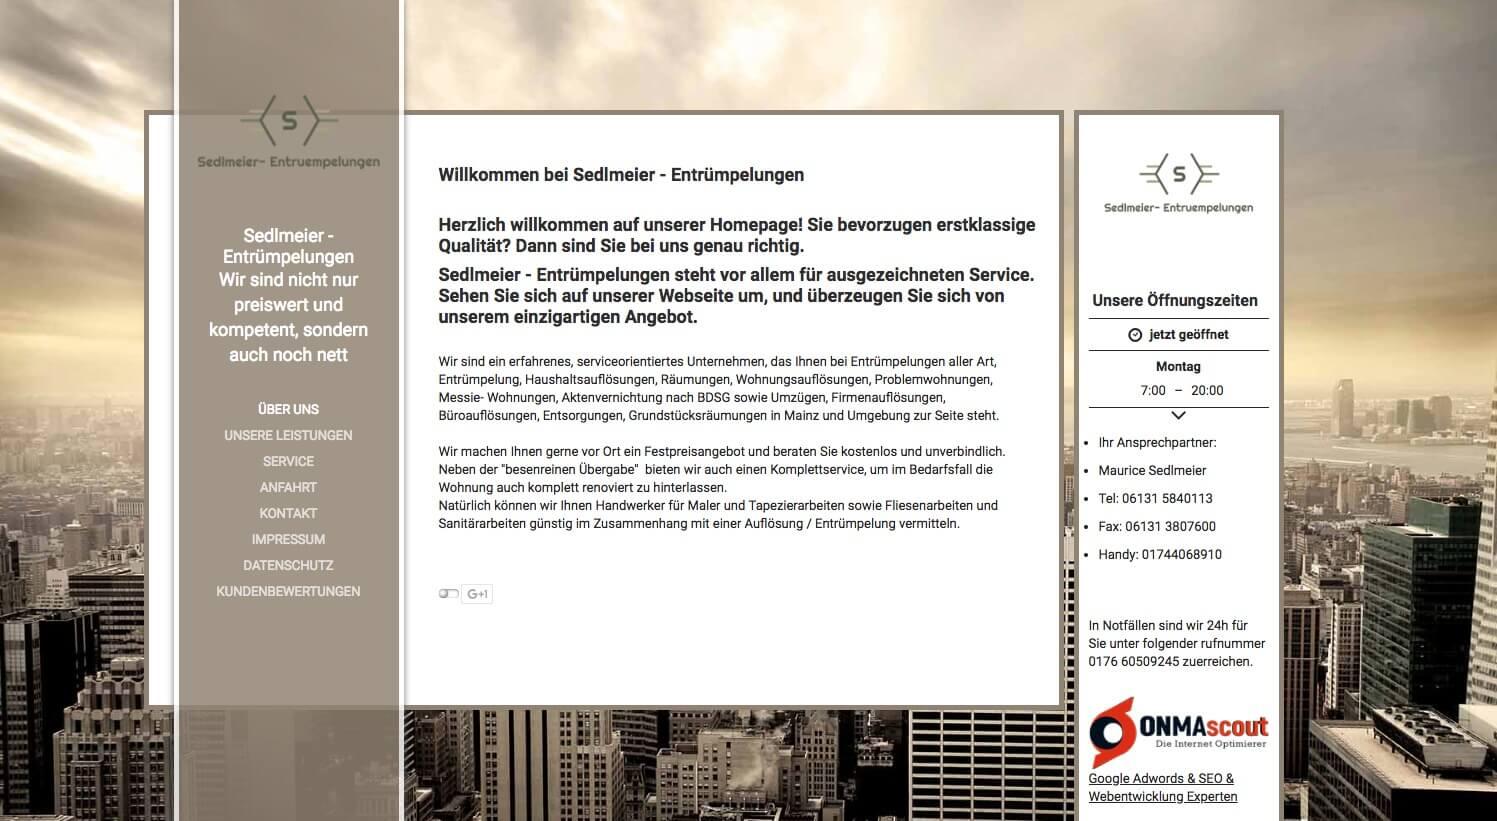 Image of Kompetenter Service bei Haushaltsauflösungen: Sedlmeier- Entrümpelungen in Mainz